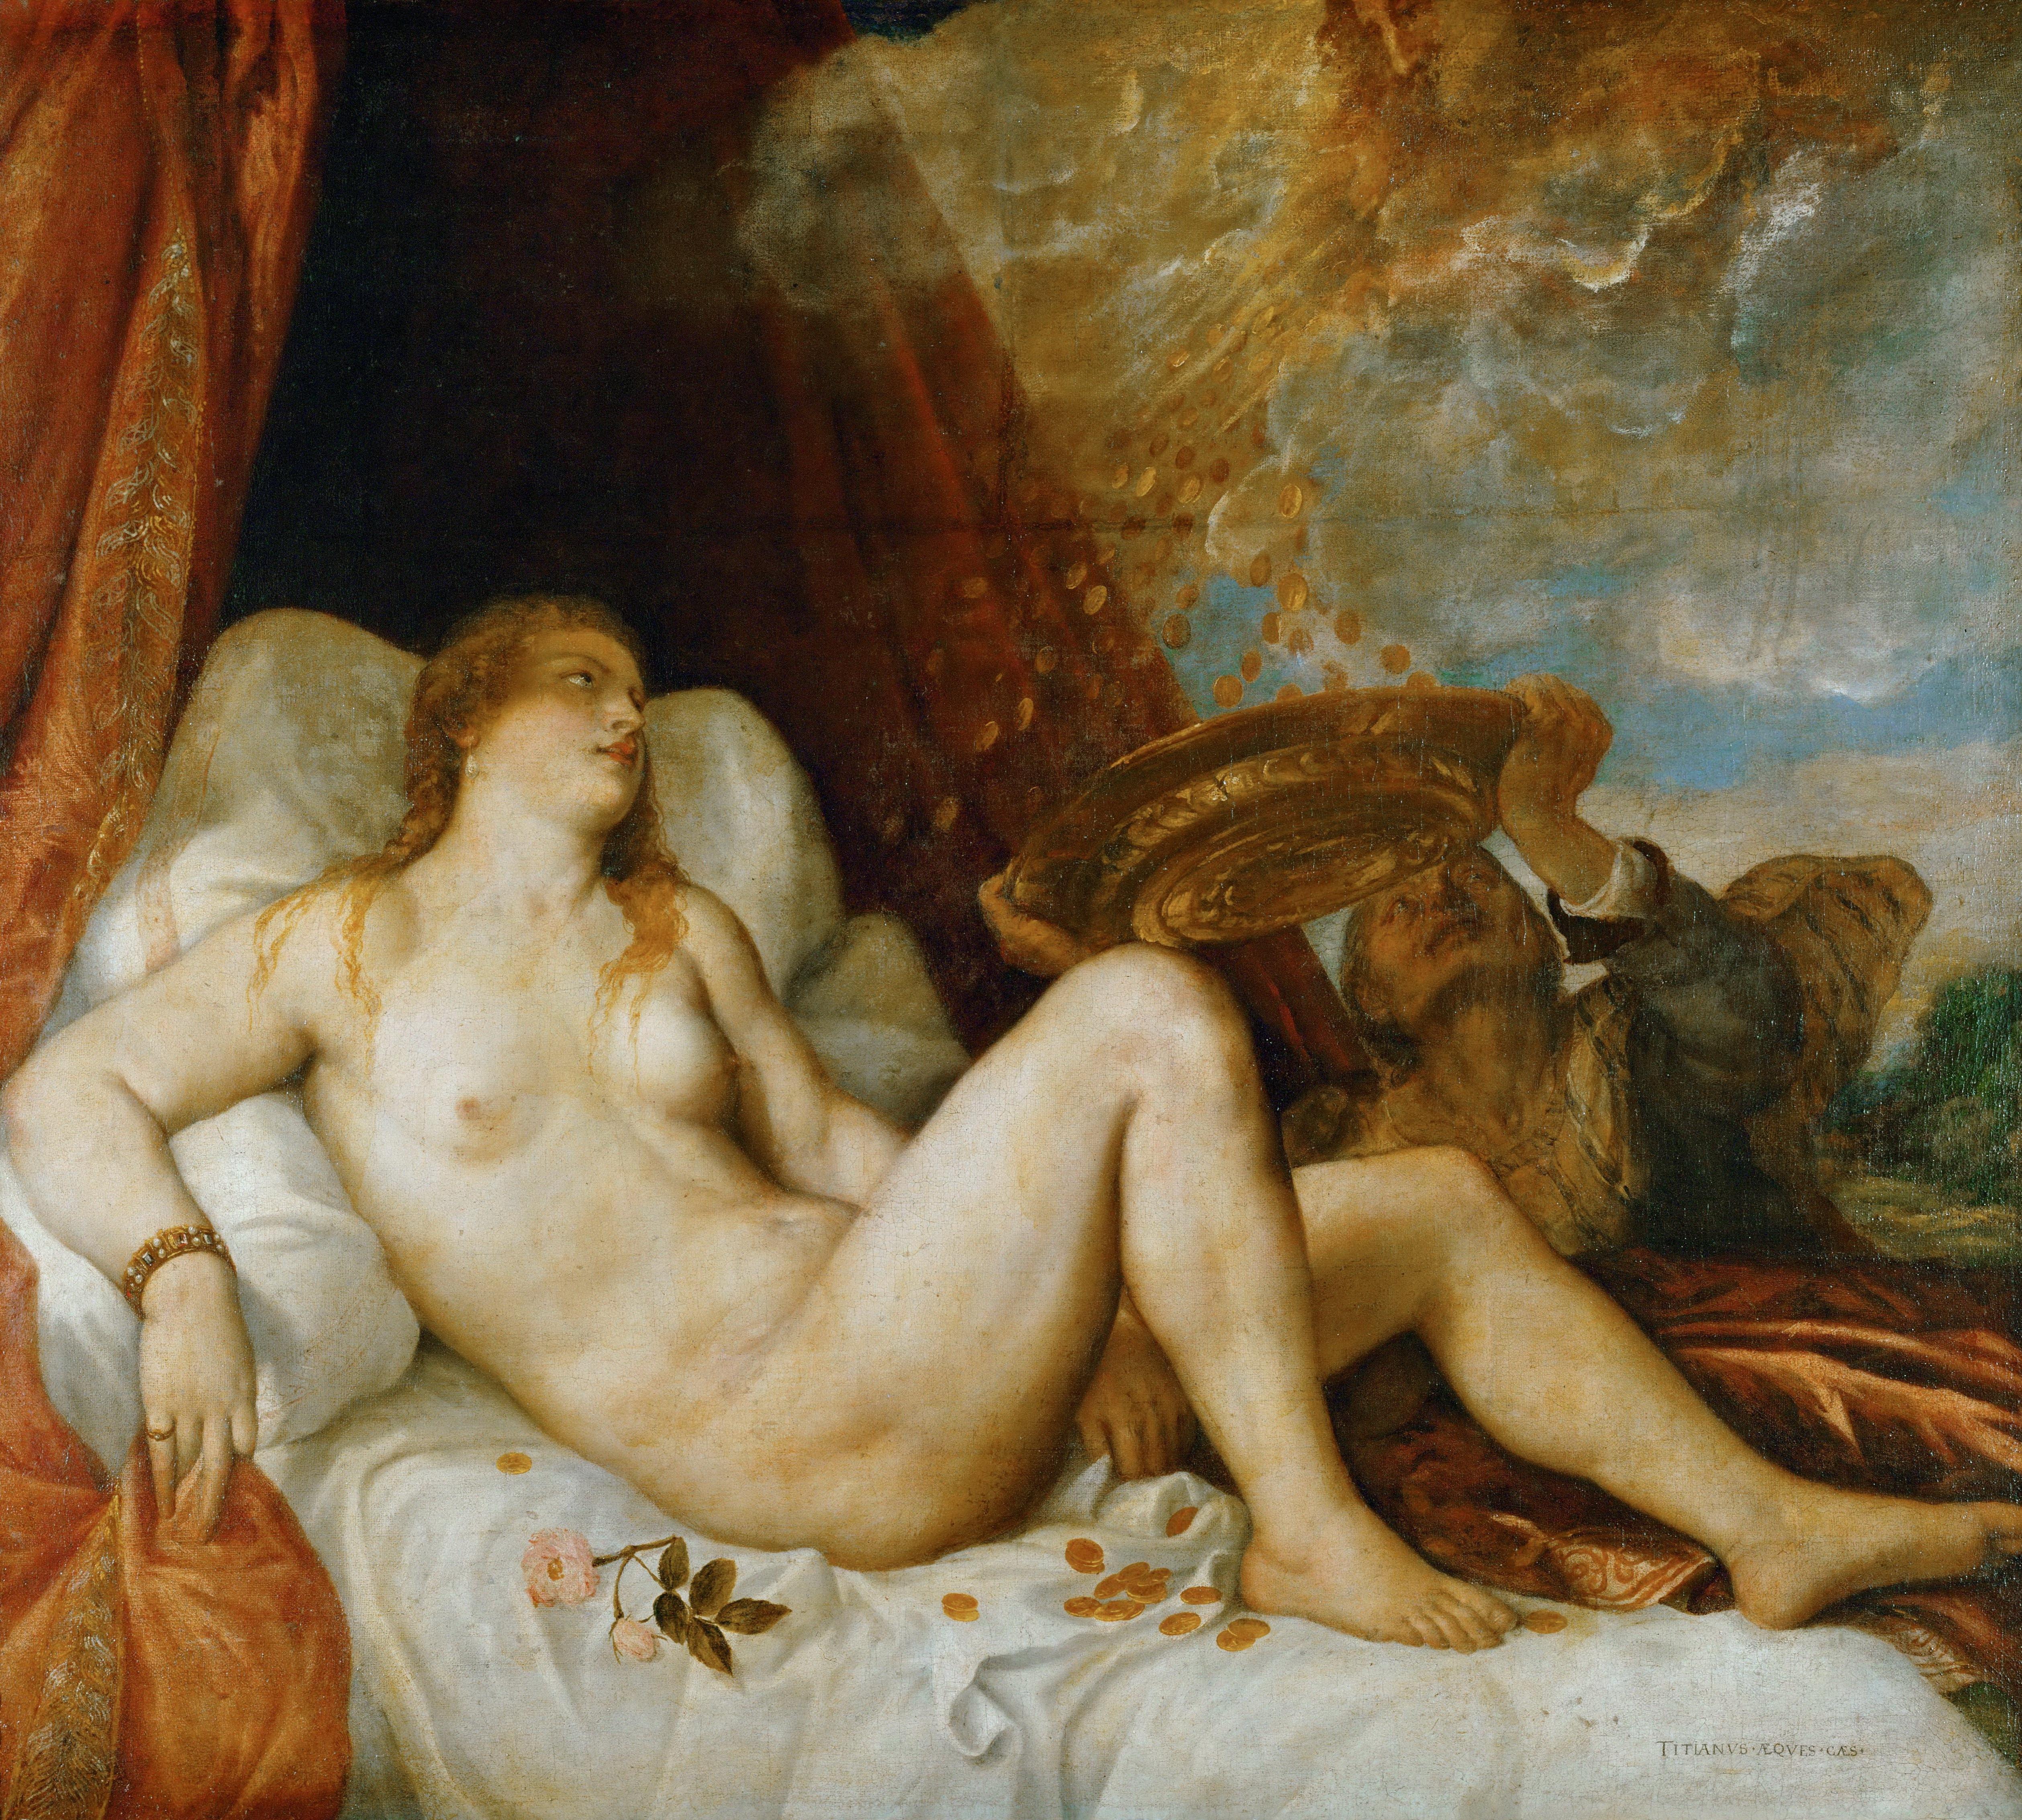 Titian Vecellio. 1488-1490 - 1576. Даная. ок.1554. 135 x 152 см. Вена, Музей истории искусства